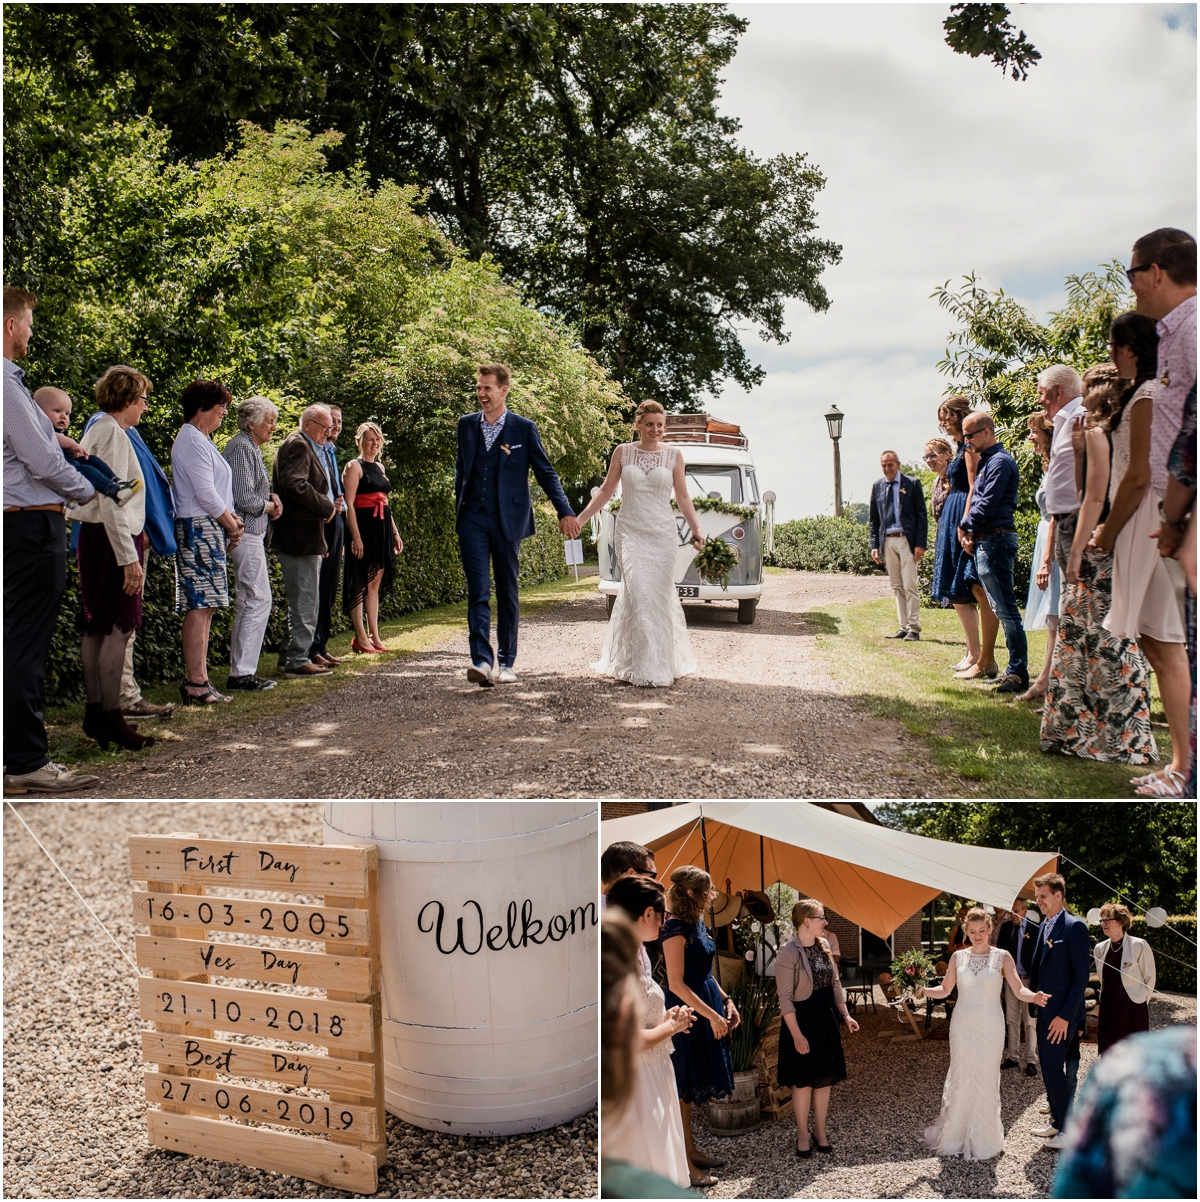 Dayofmylife,bruidsfotografie,prinschenhoeve,zomerse bruiloft,4